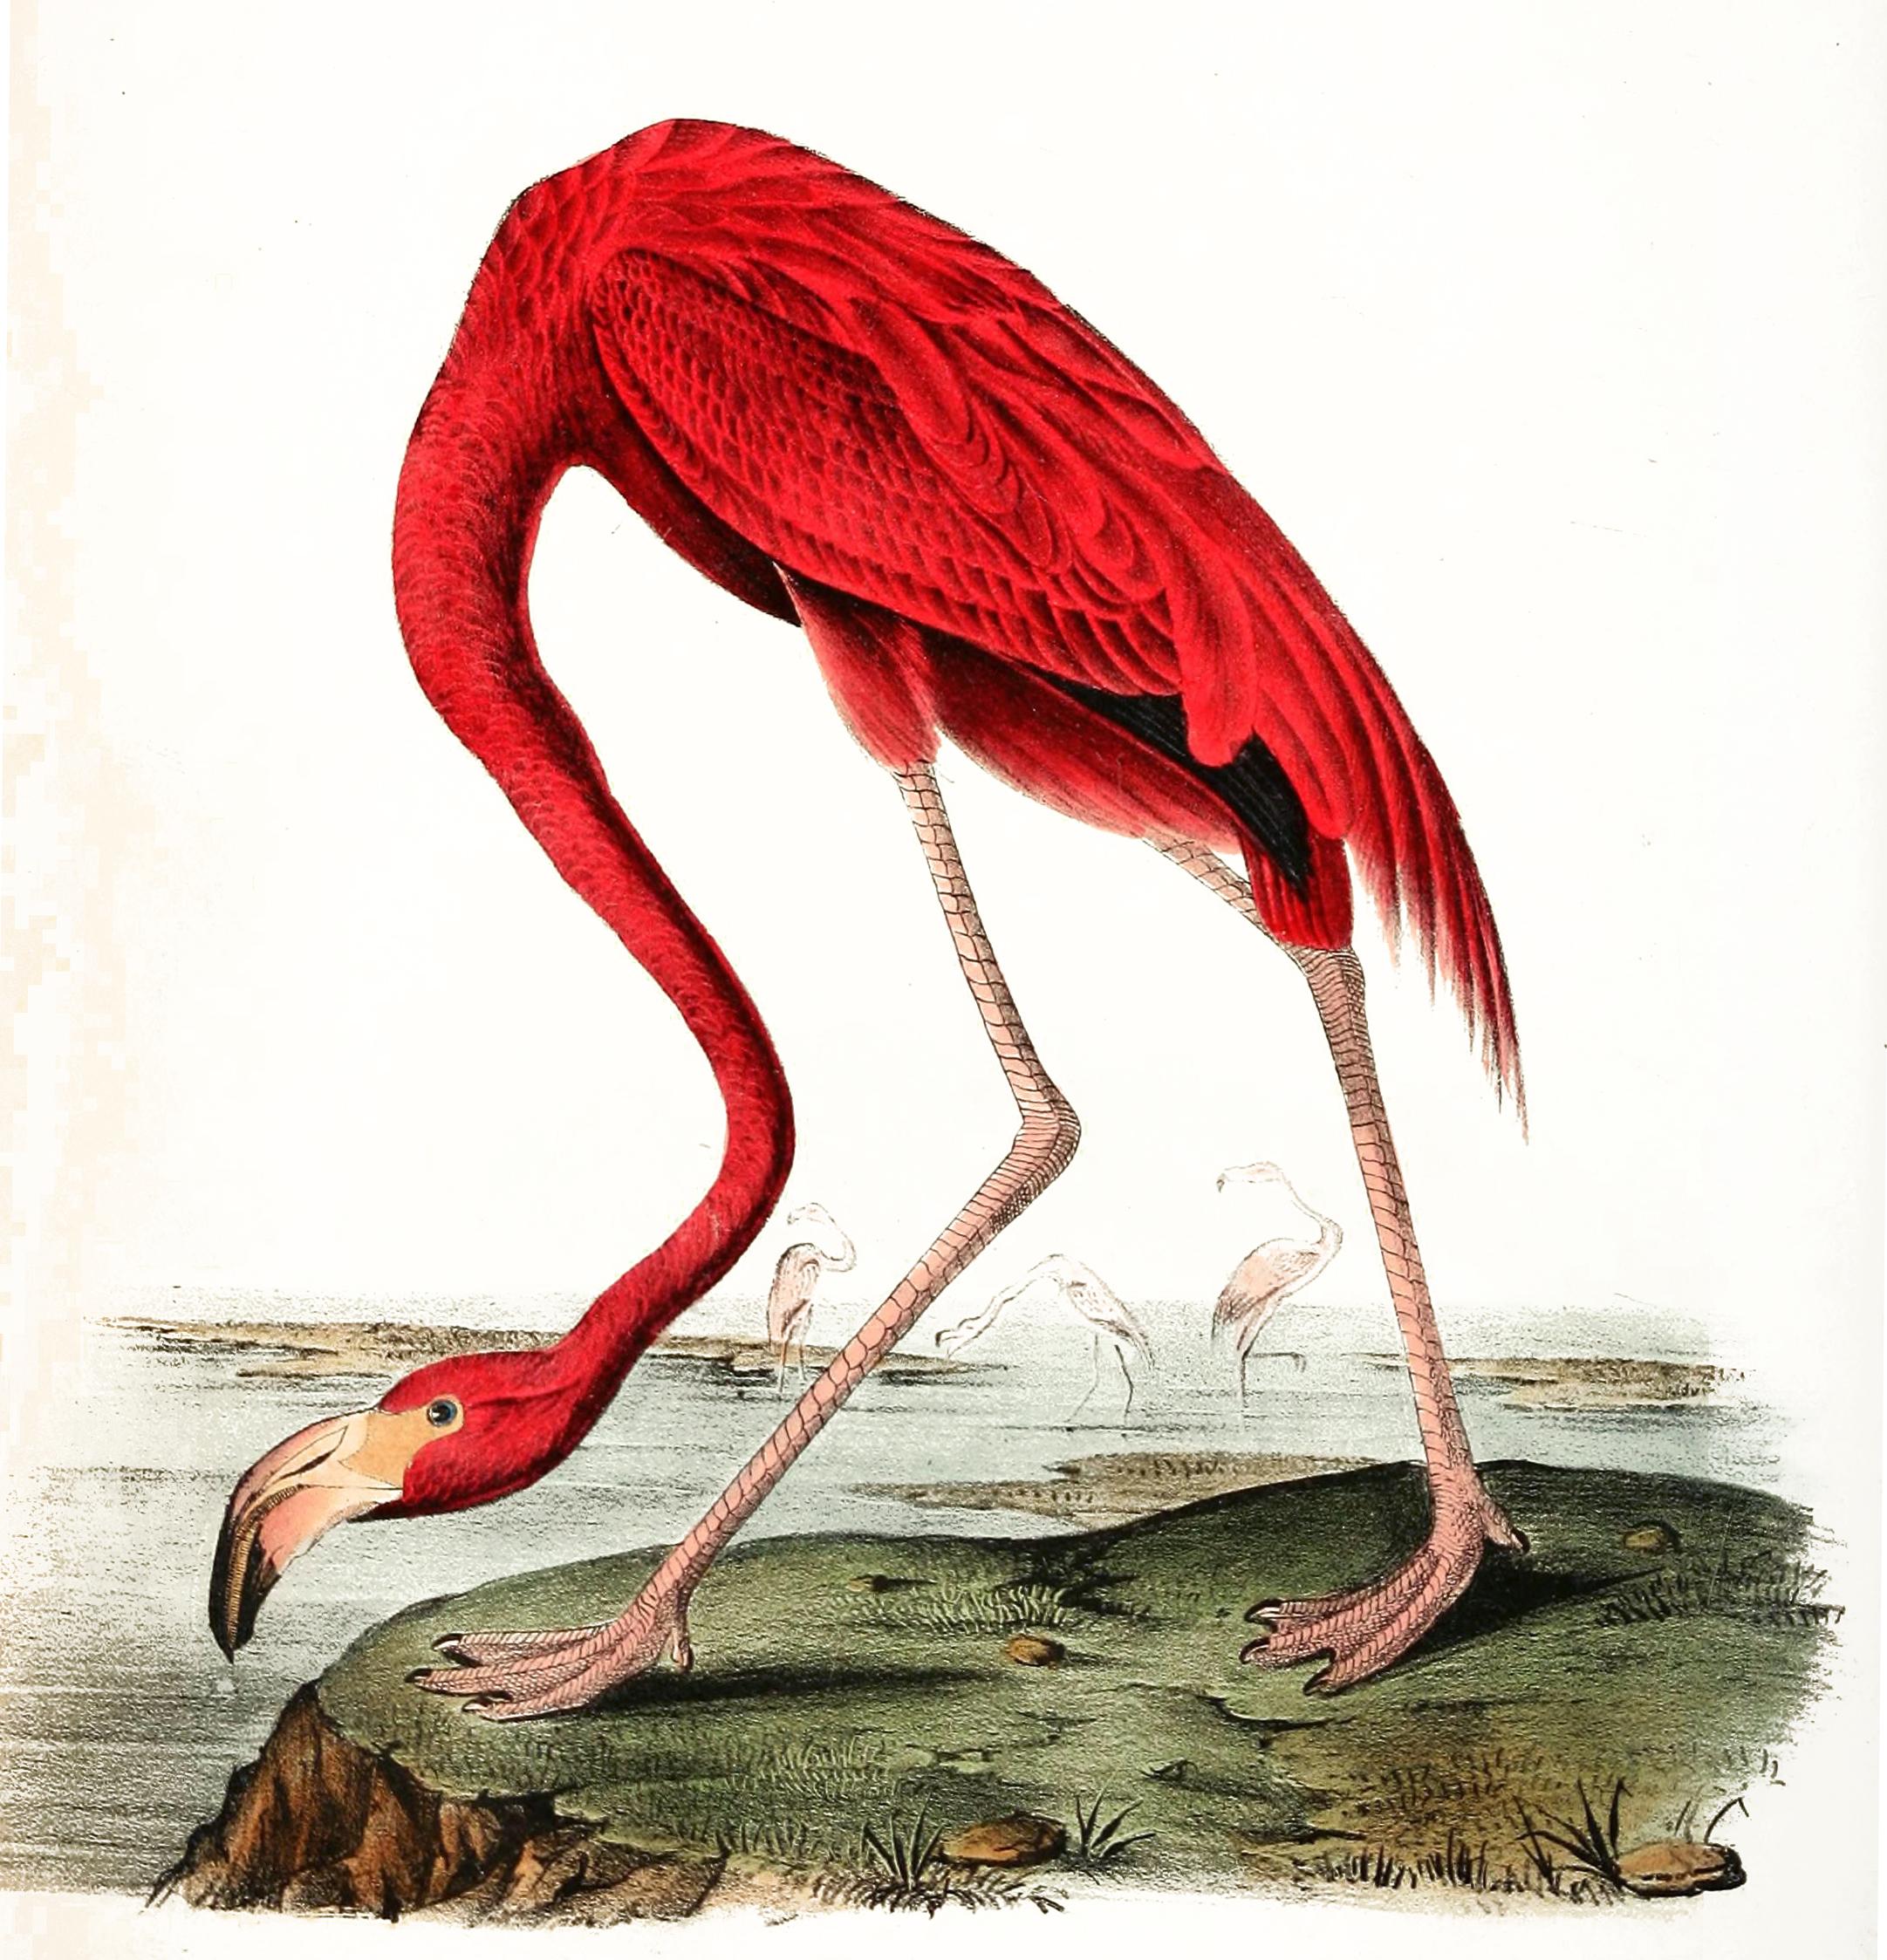 American flamingo painting - photo#24